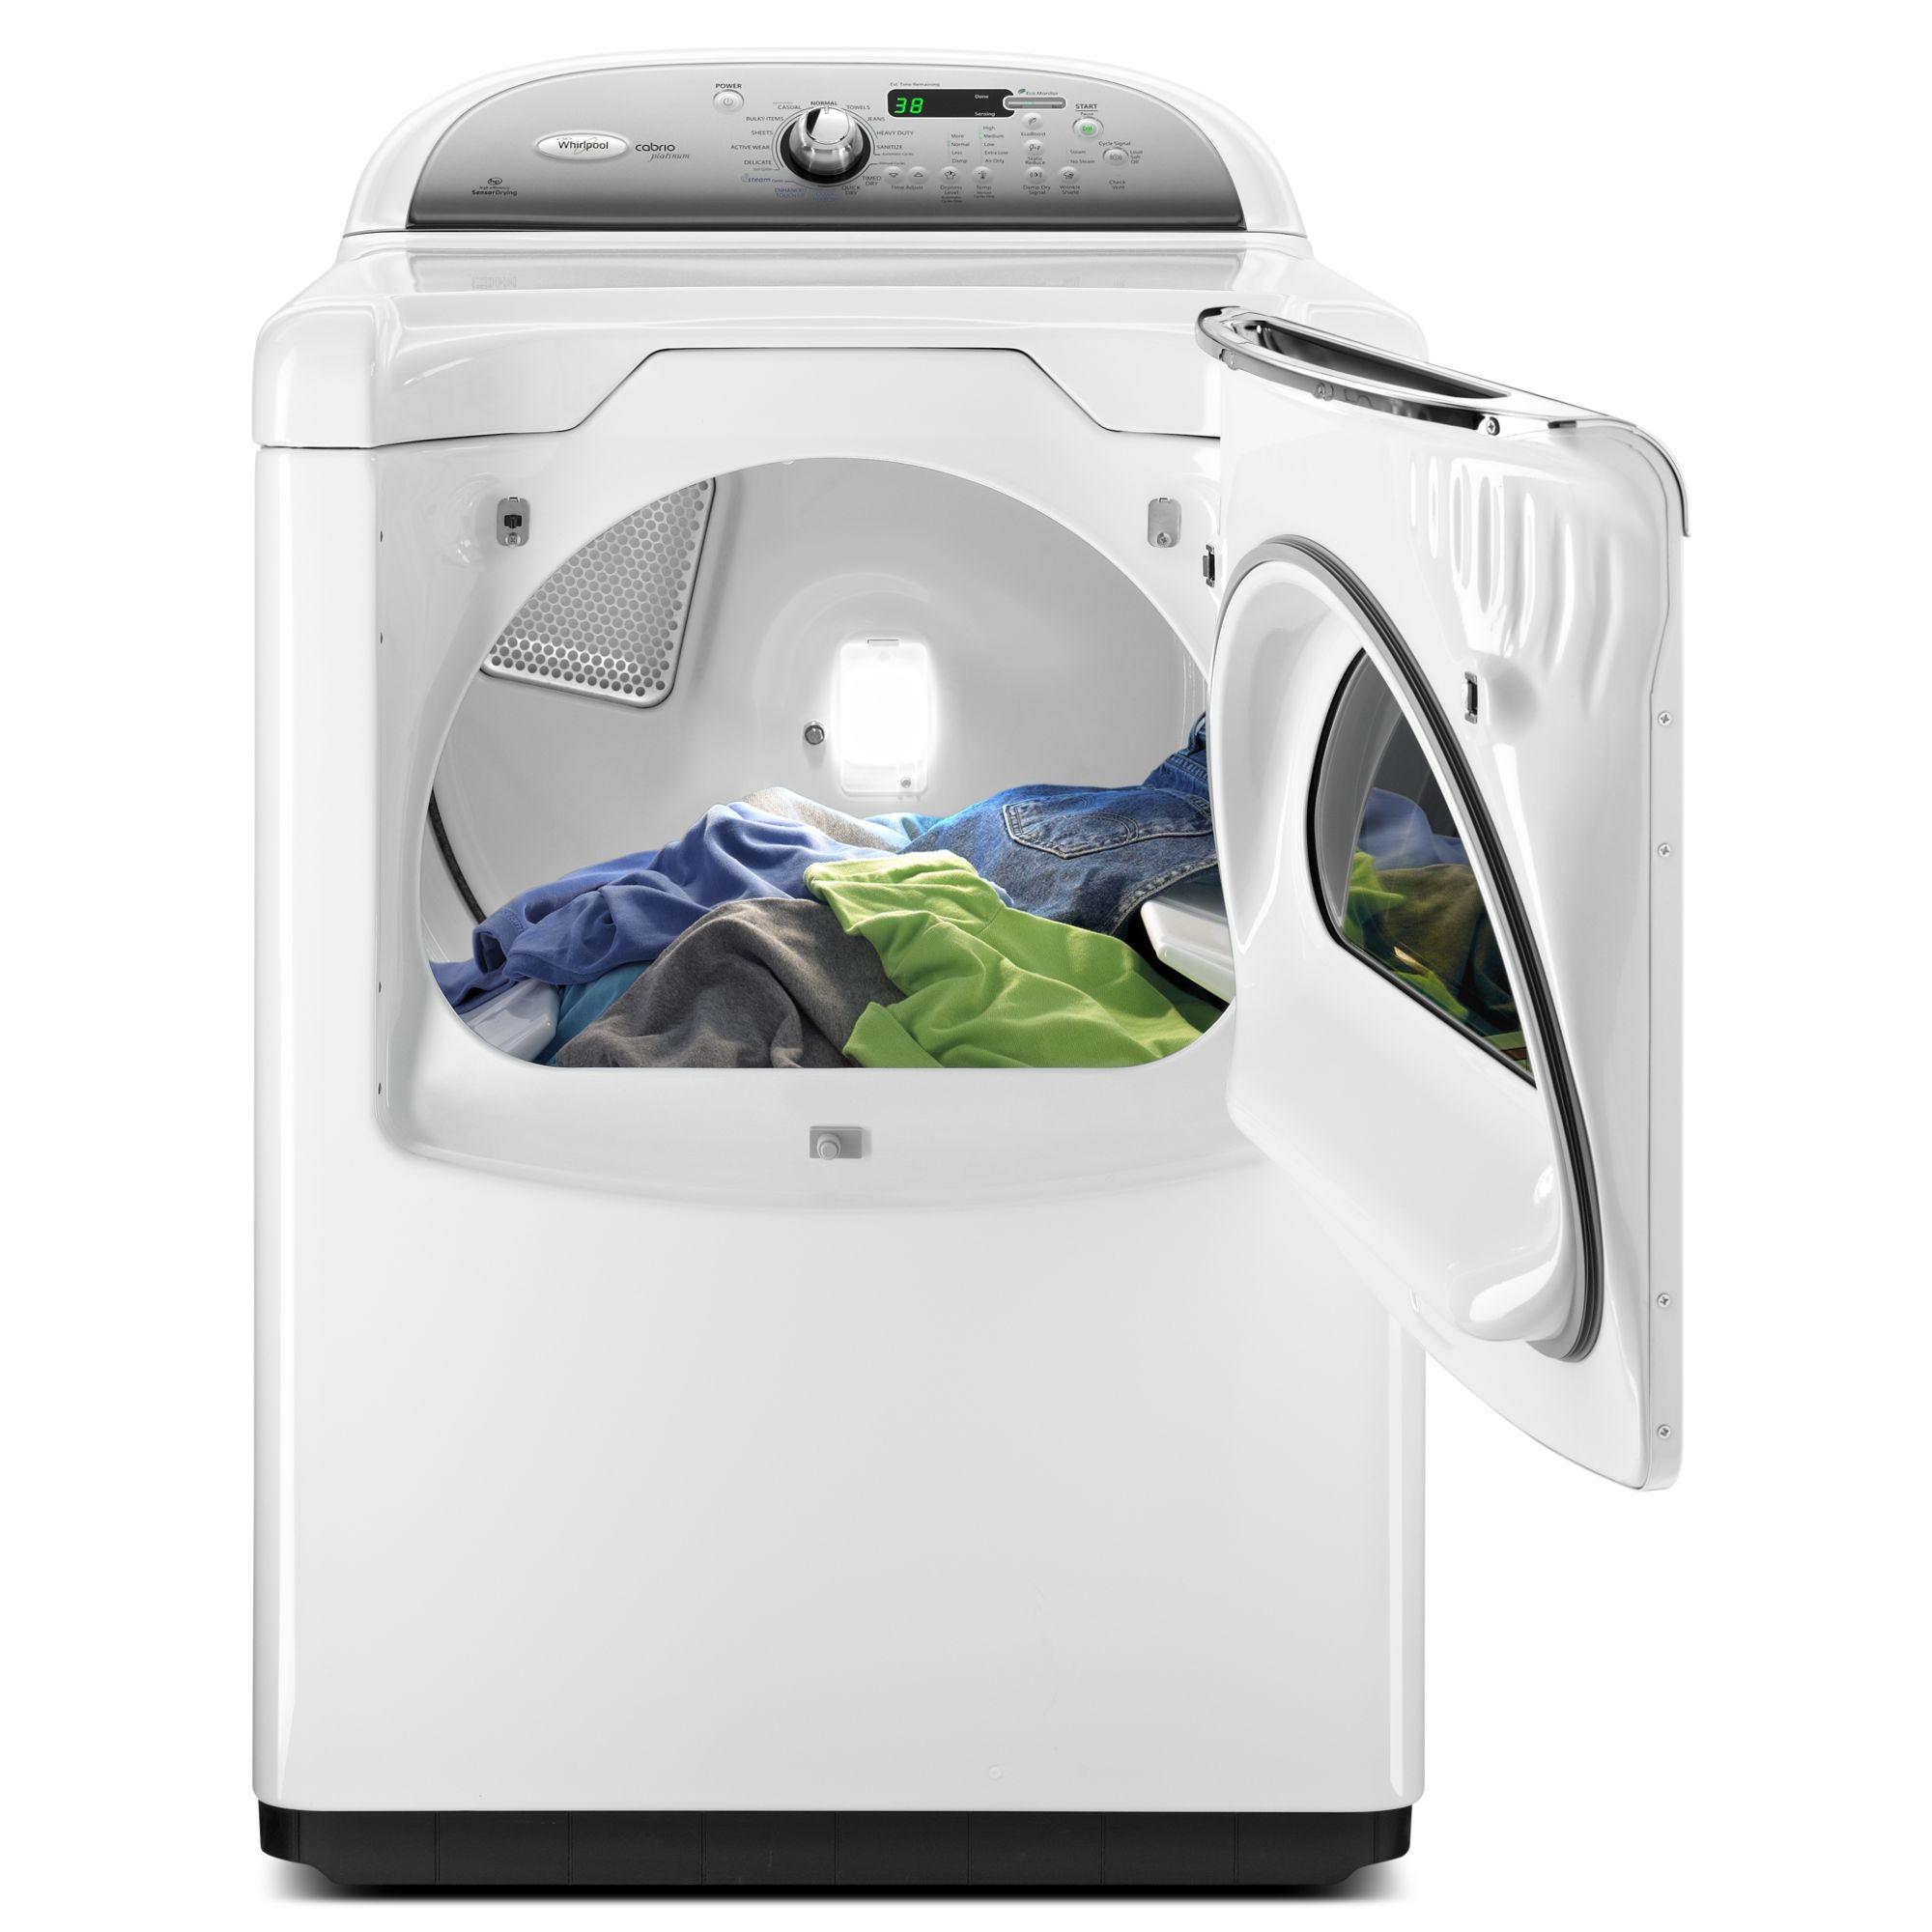 Whirlpool 7.6 cu. ft. Cabrio® Platinum Steam Gas Dryer w/ Static Reduce - White